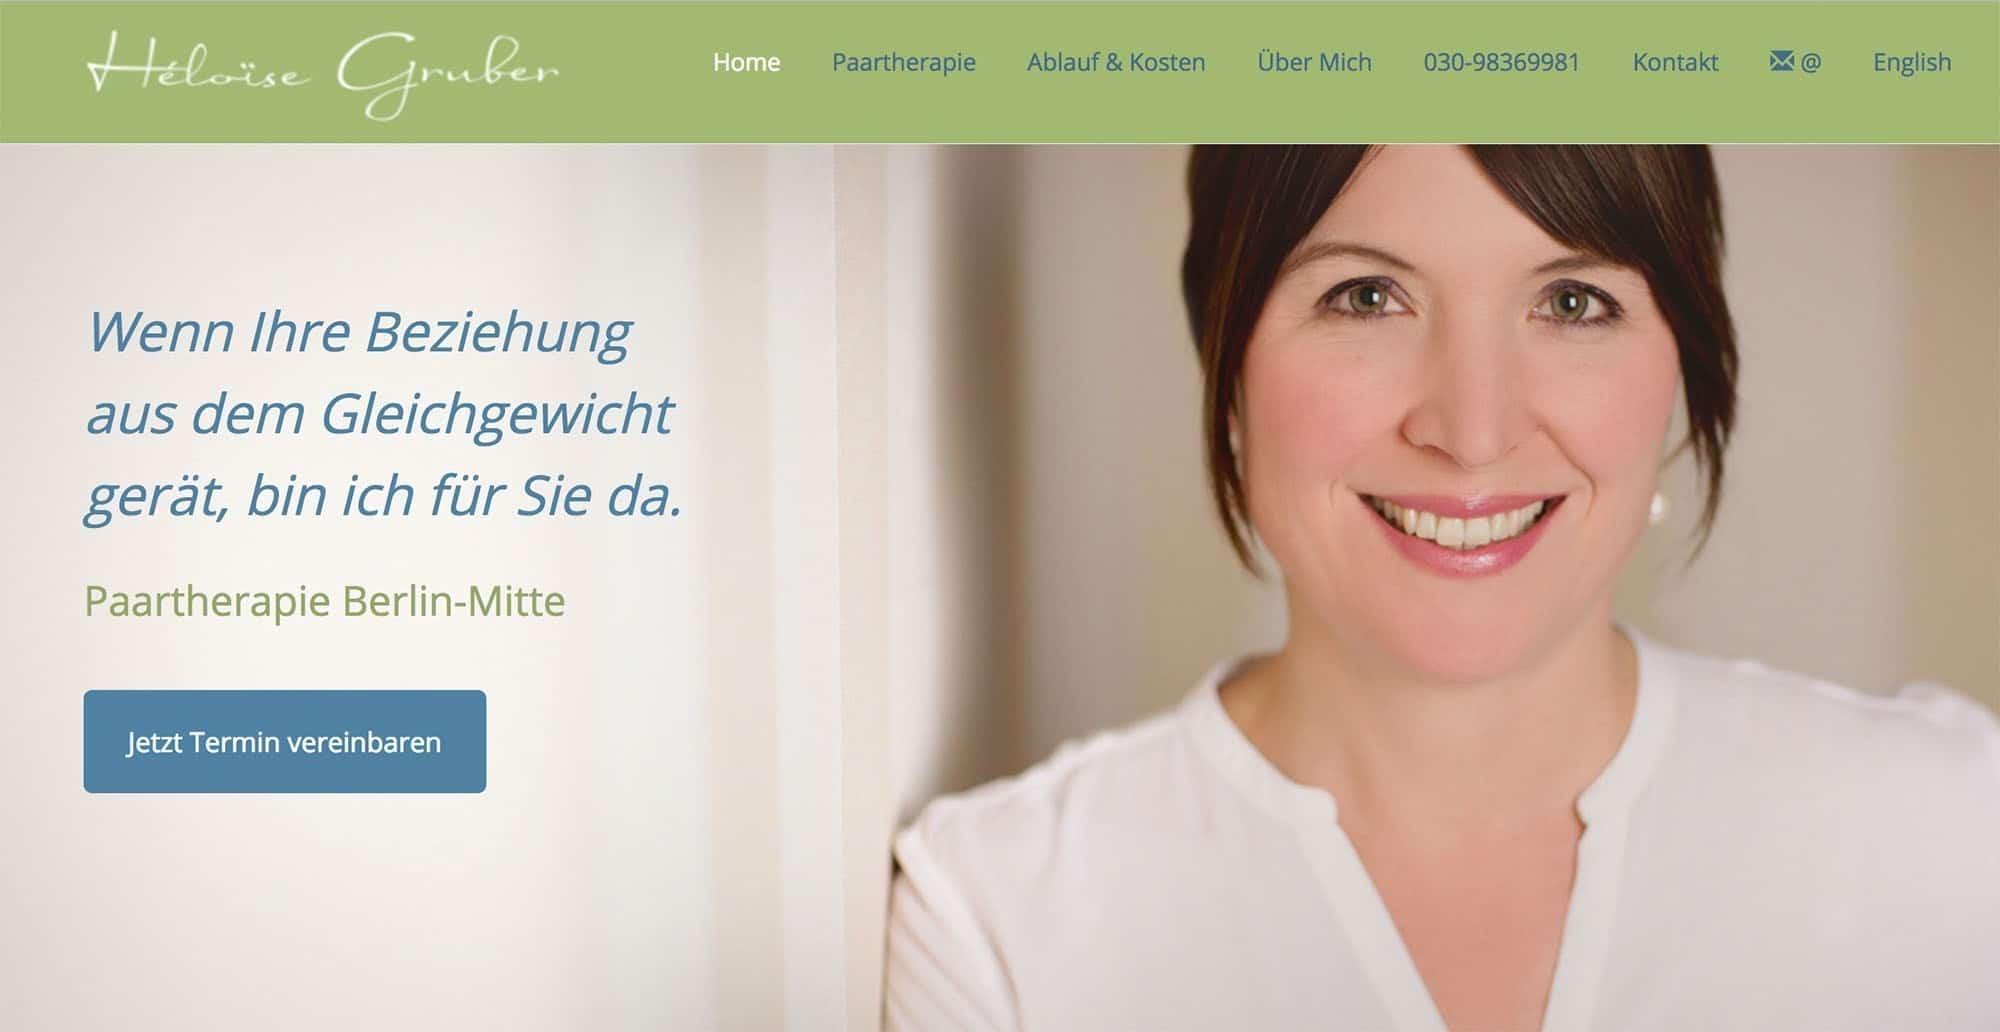 Heloise Gruber - Paartherapie